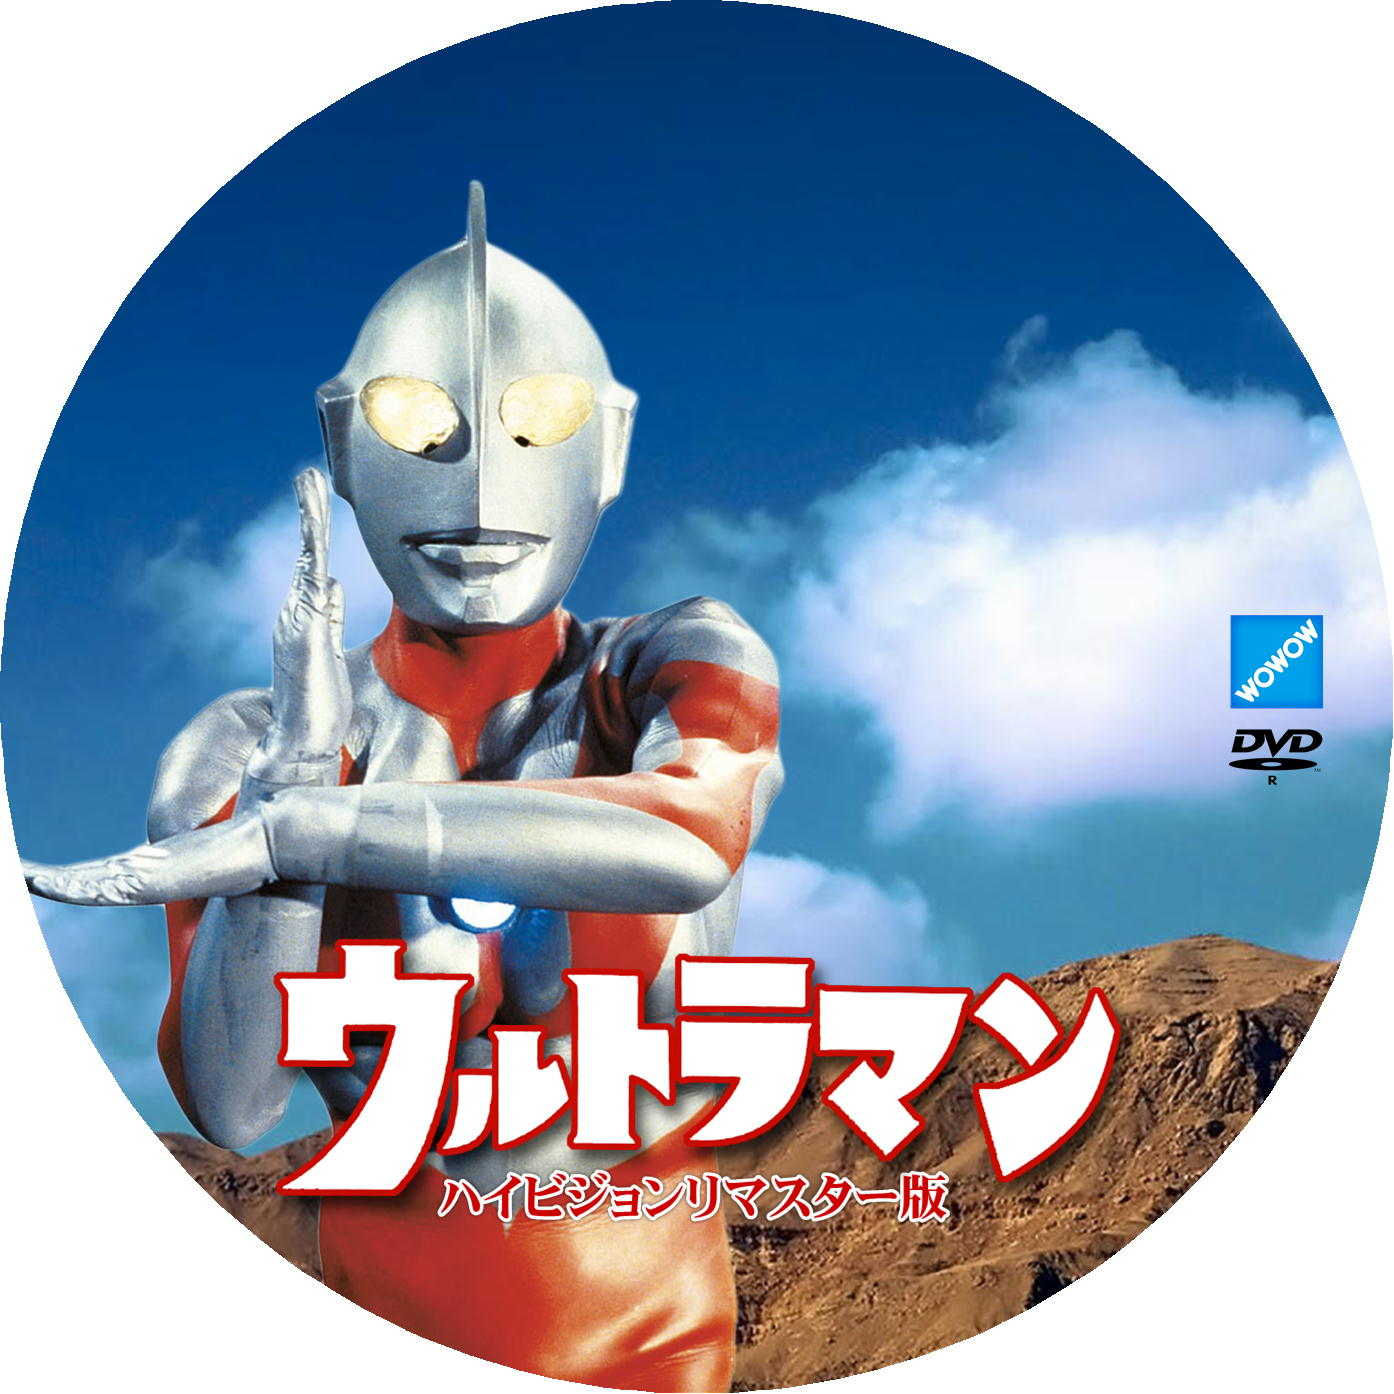 DVD画像1